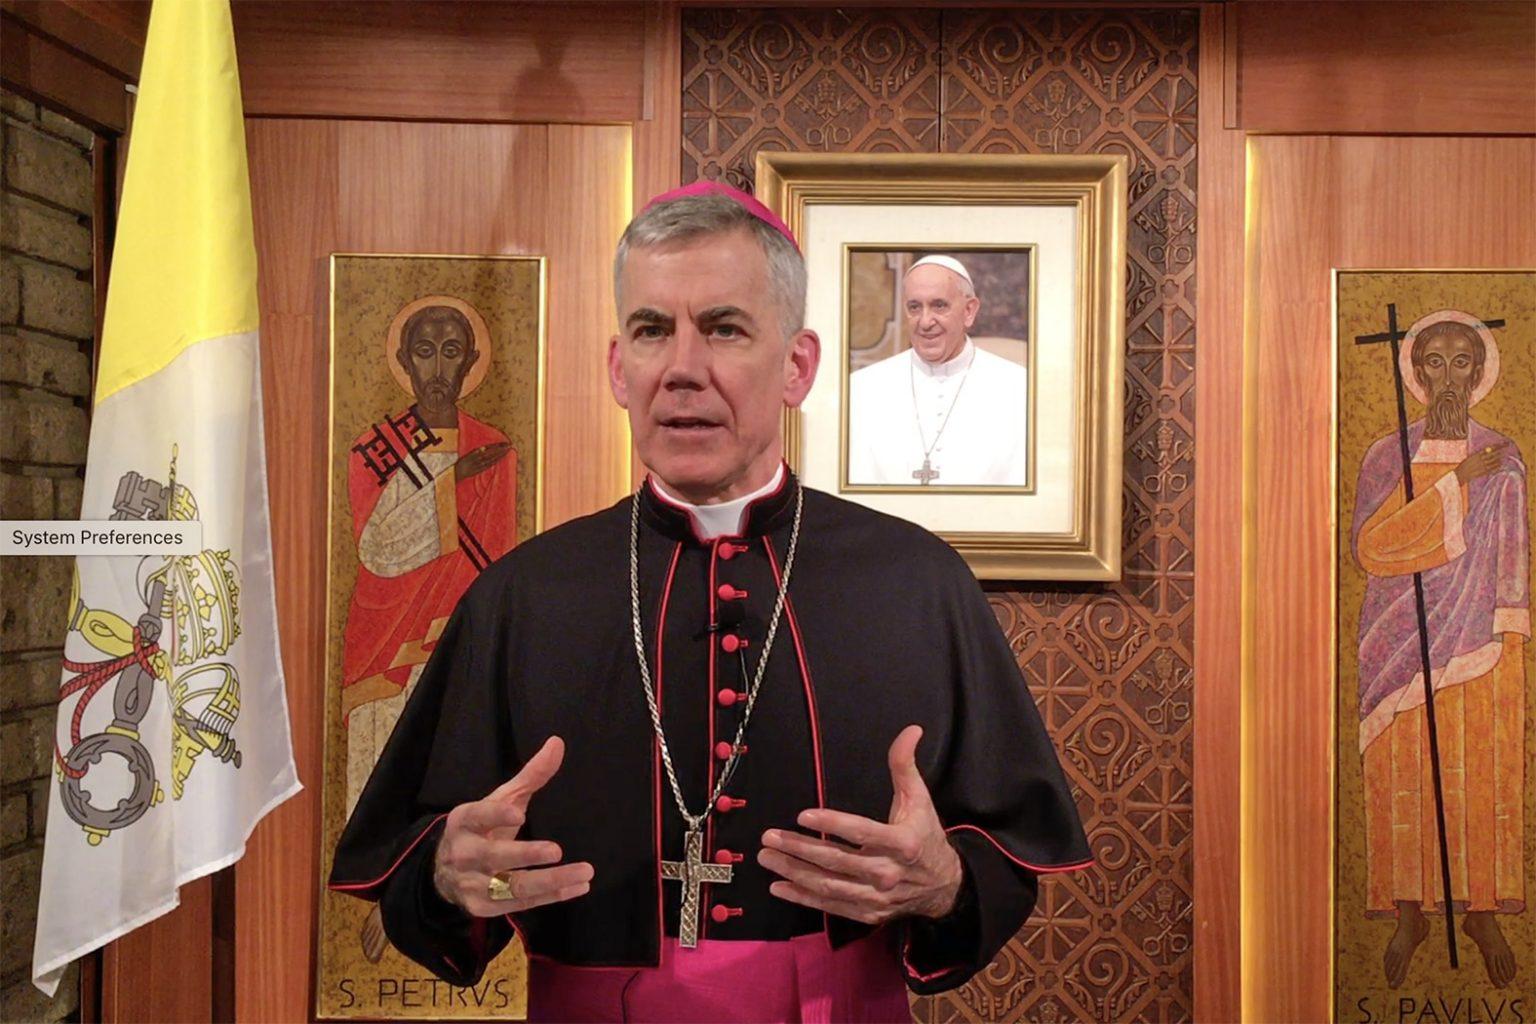 Nuncio calls Catholics to 'forefront' of ecumenism